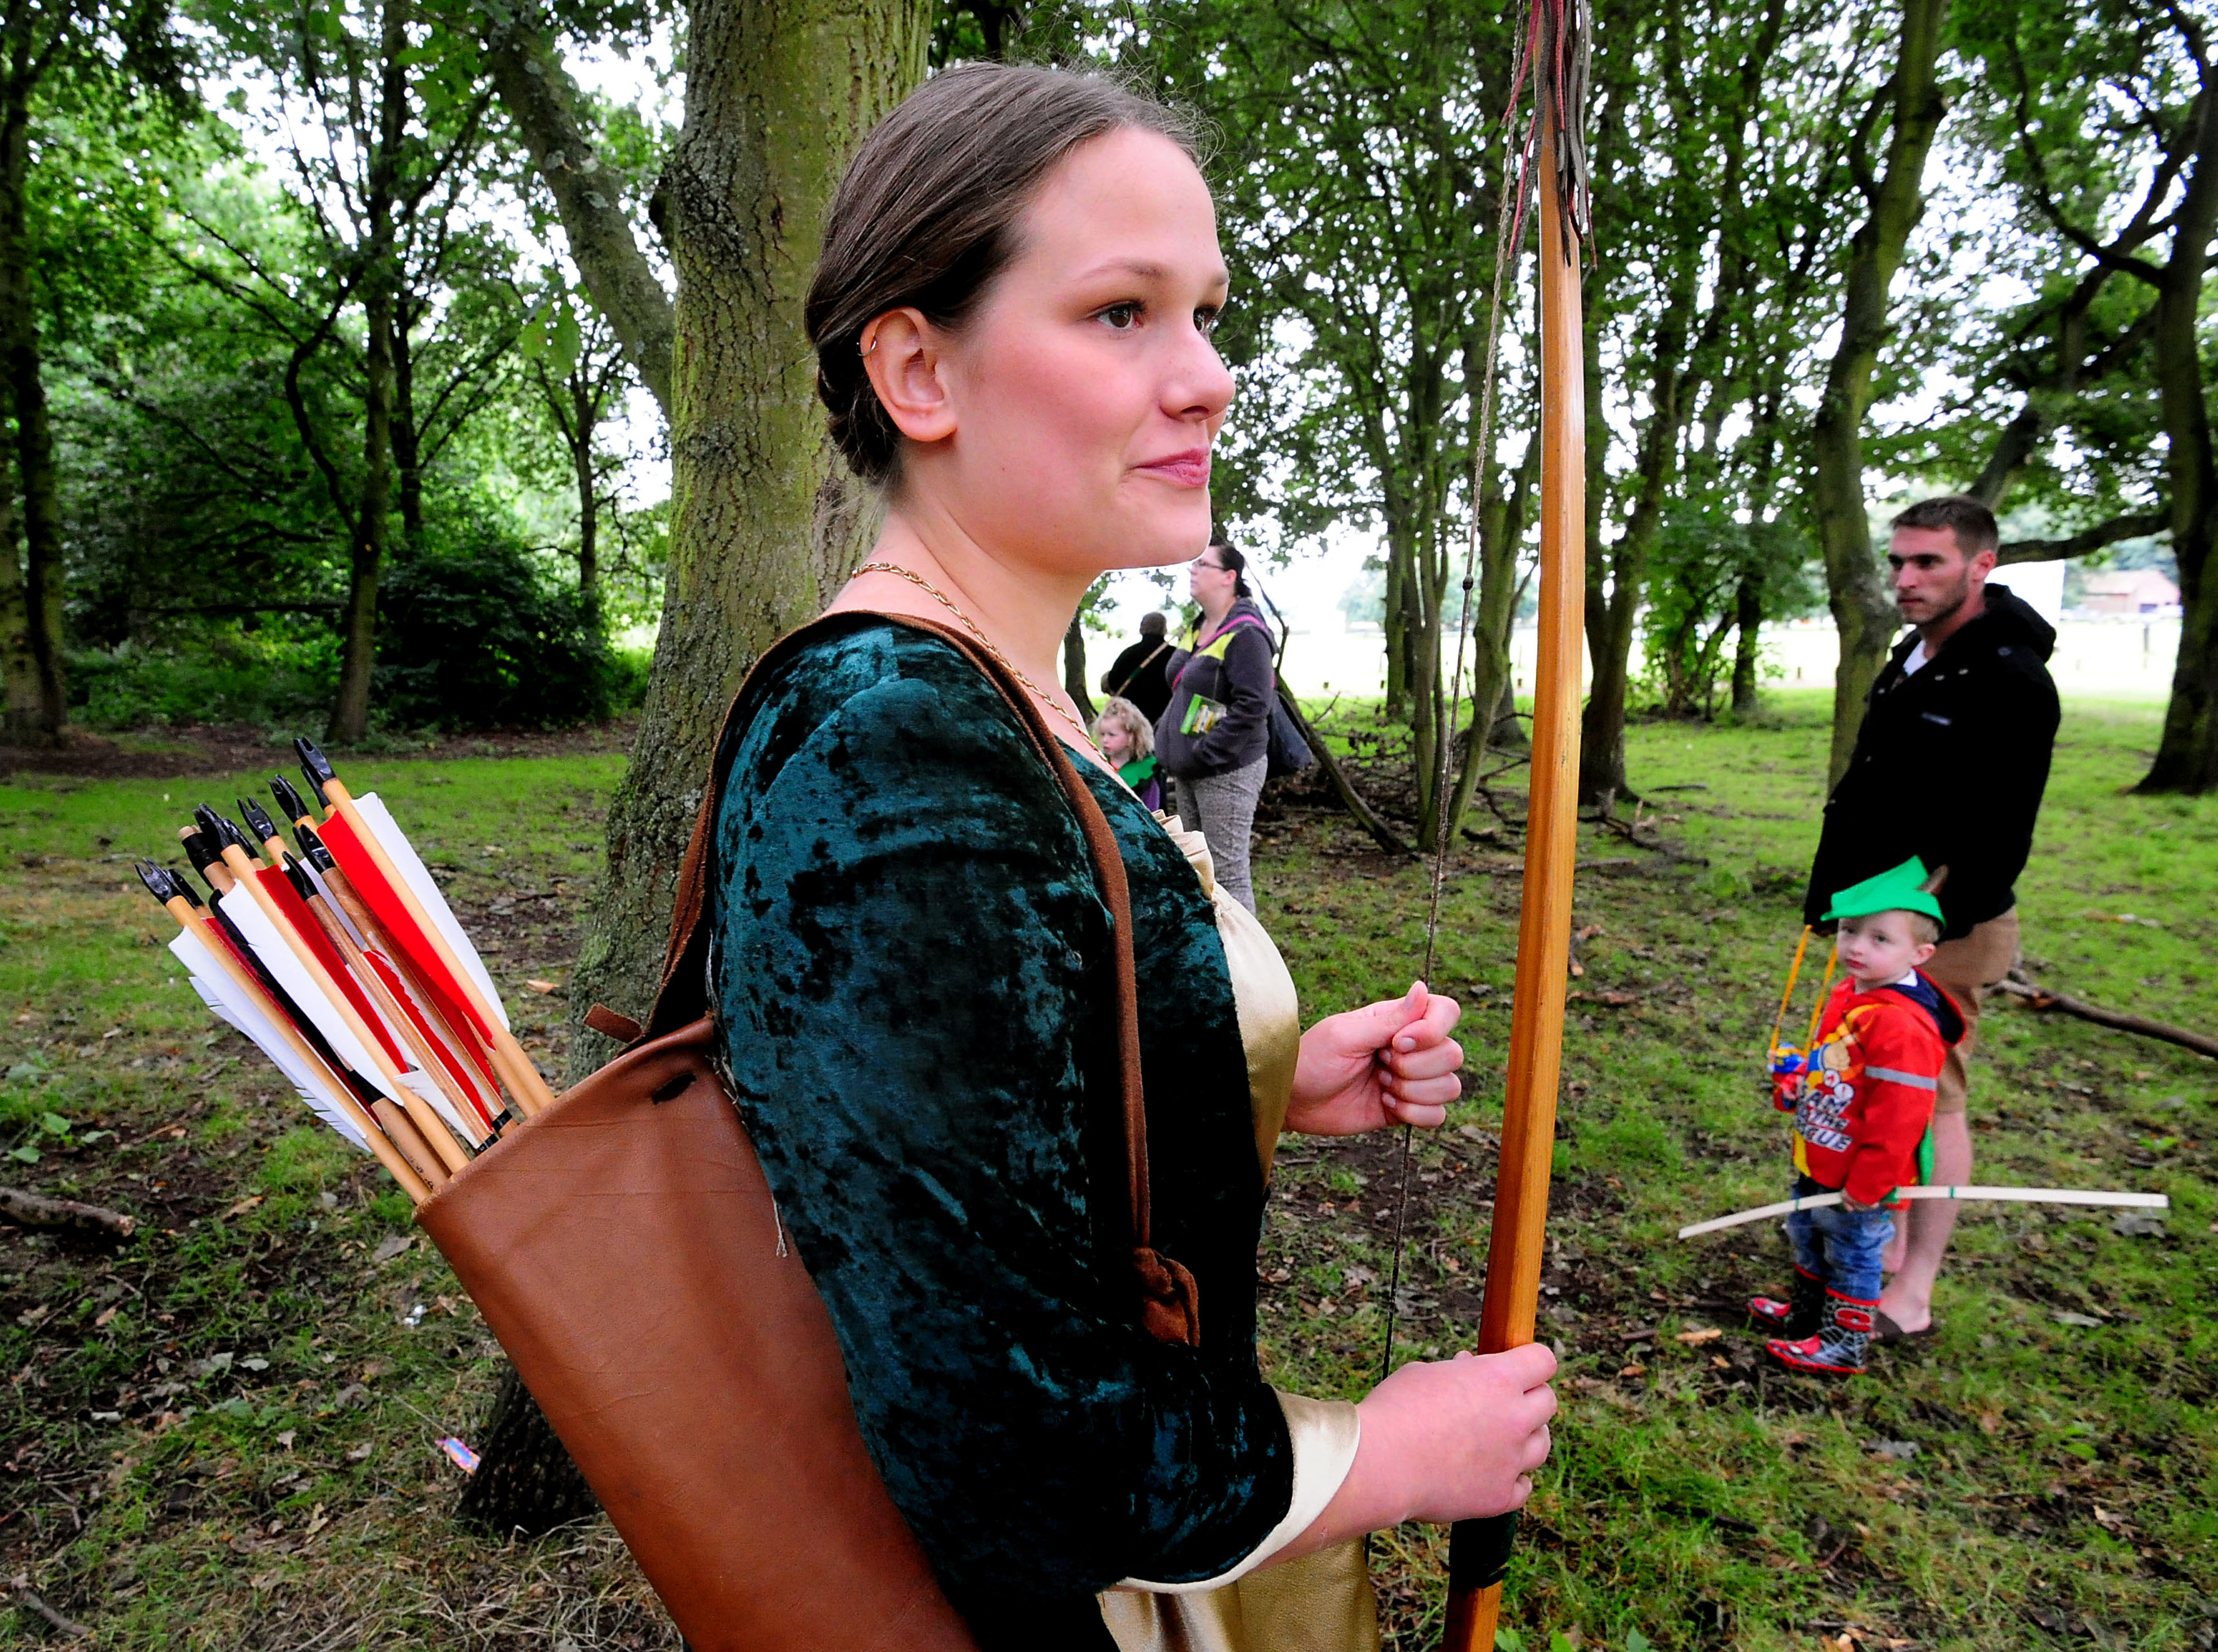 Gallery: Robin Hood Festival at Sherwood 2013